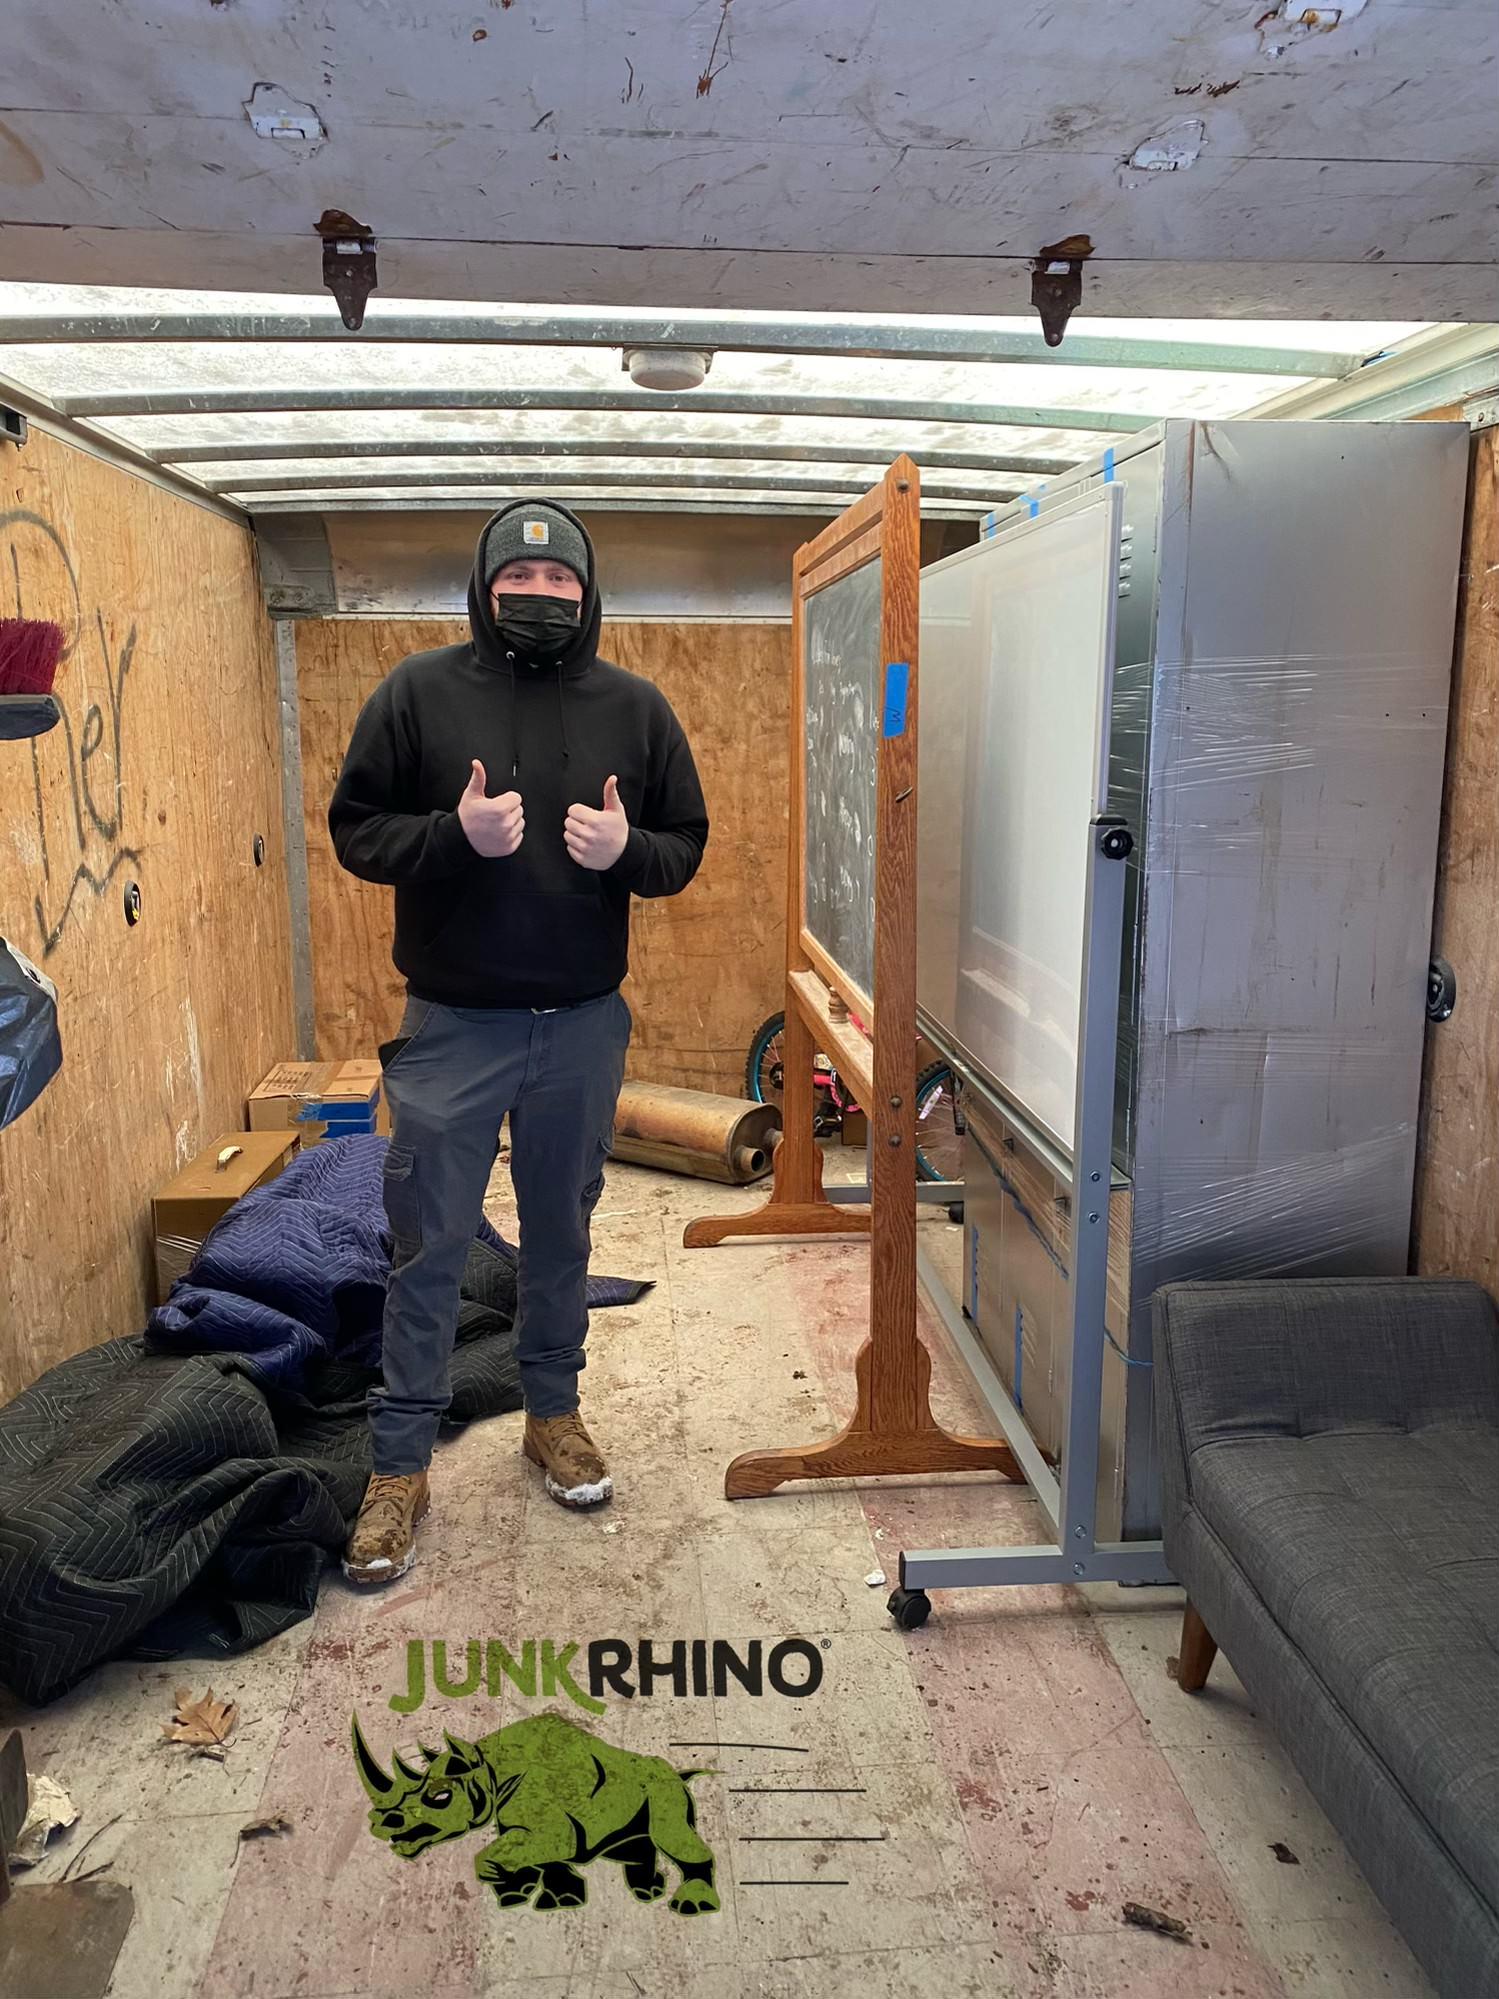 Junk Rhino